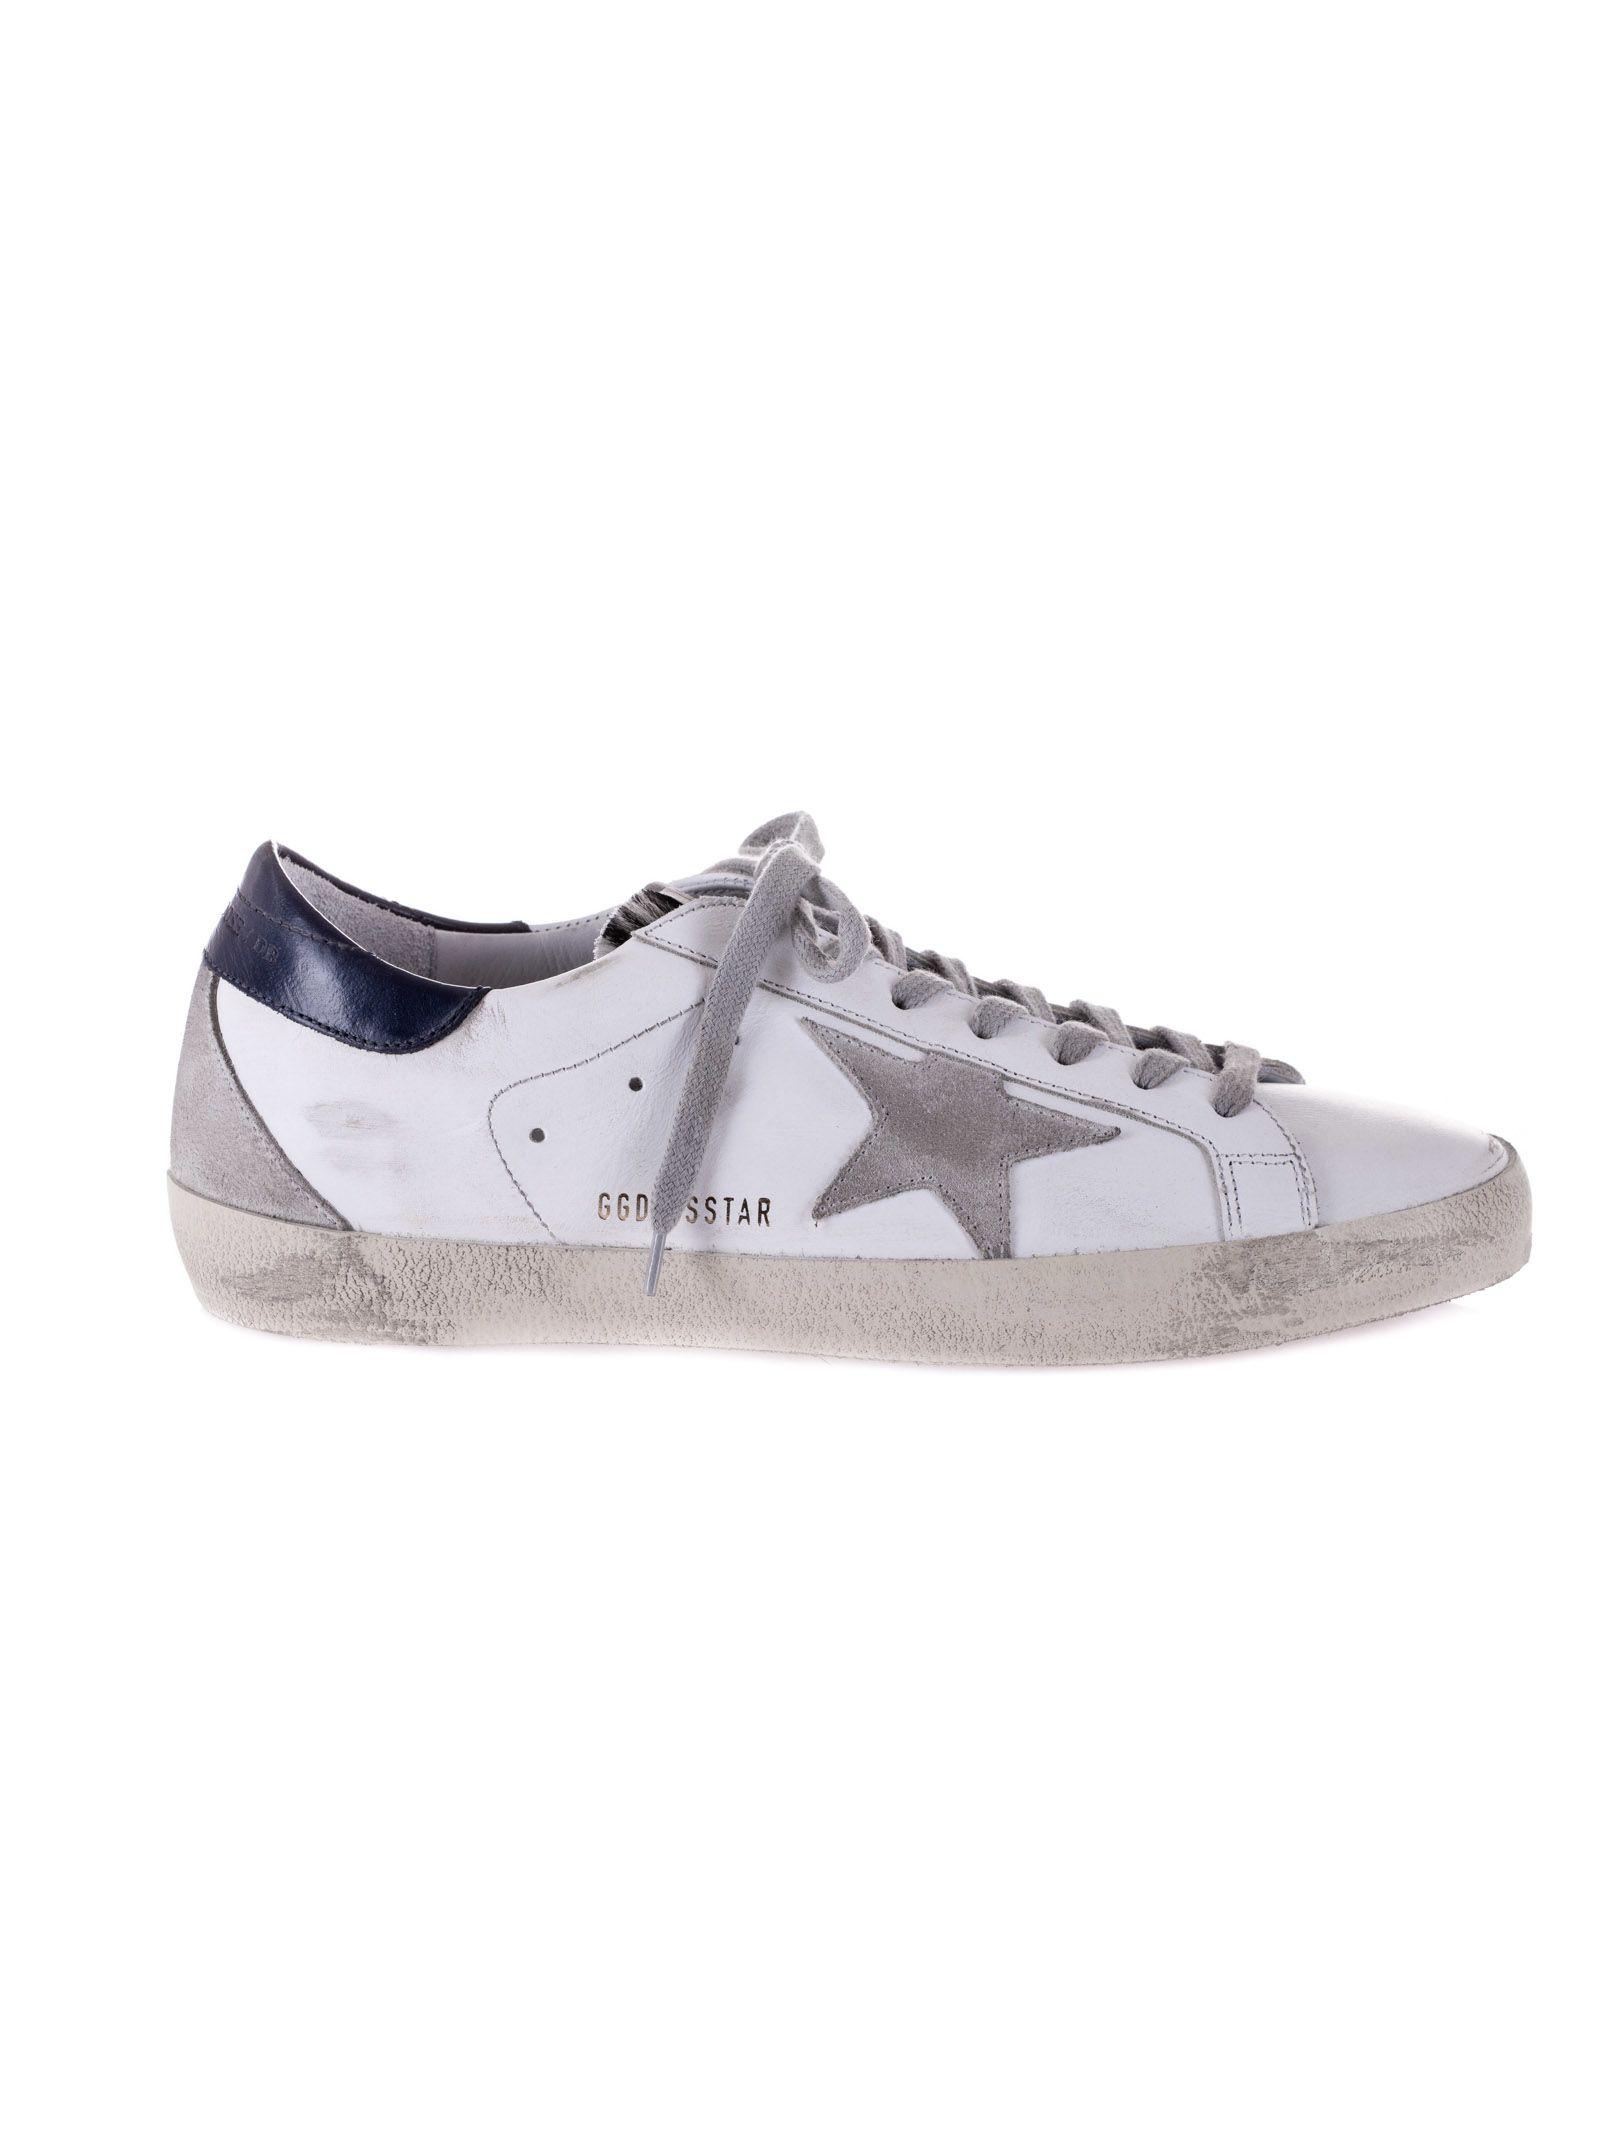 d80a2f137e3 Golden Goose Golden Goose Superstar Sneakers - White Blue - 8062273 ...